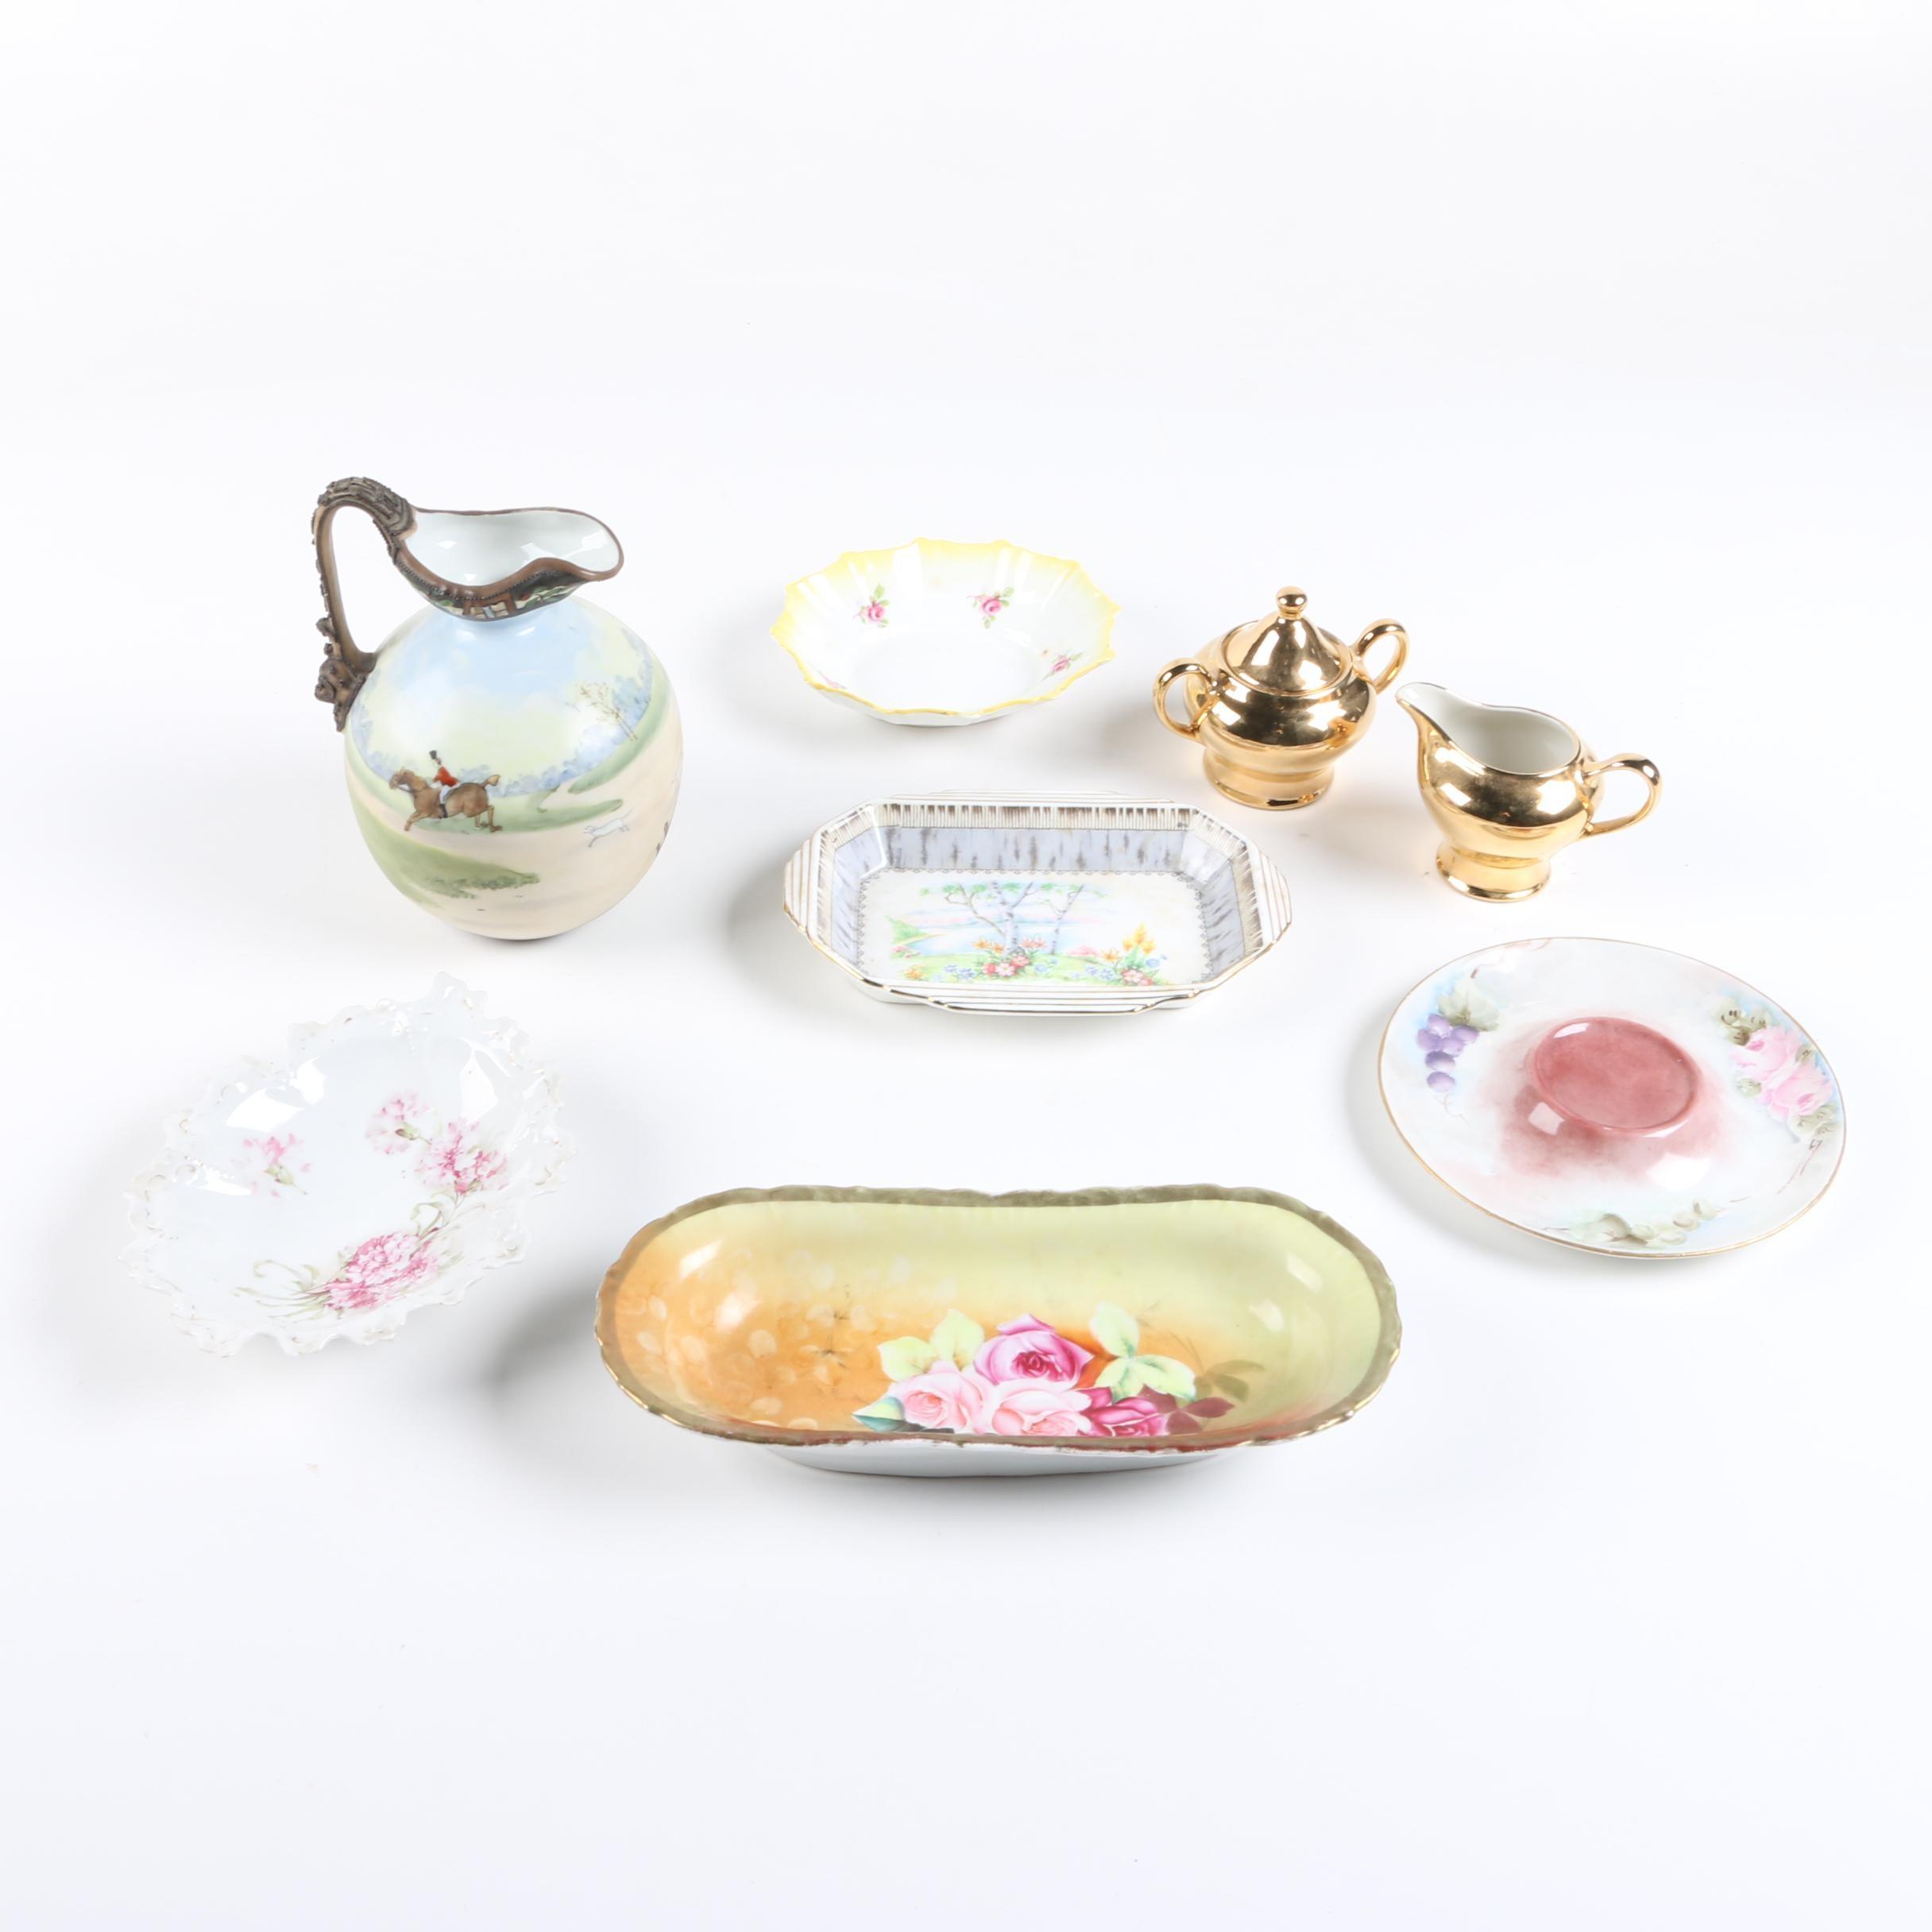 Vintage Tableware Including Royal Stafford and Royal Albert